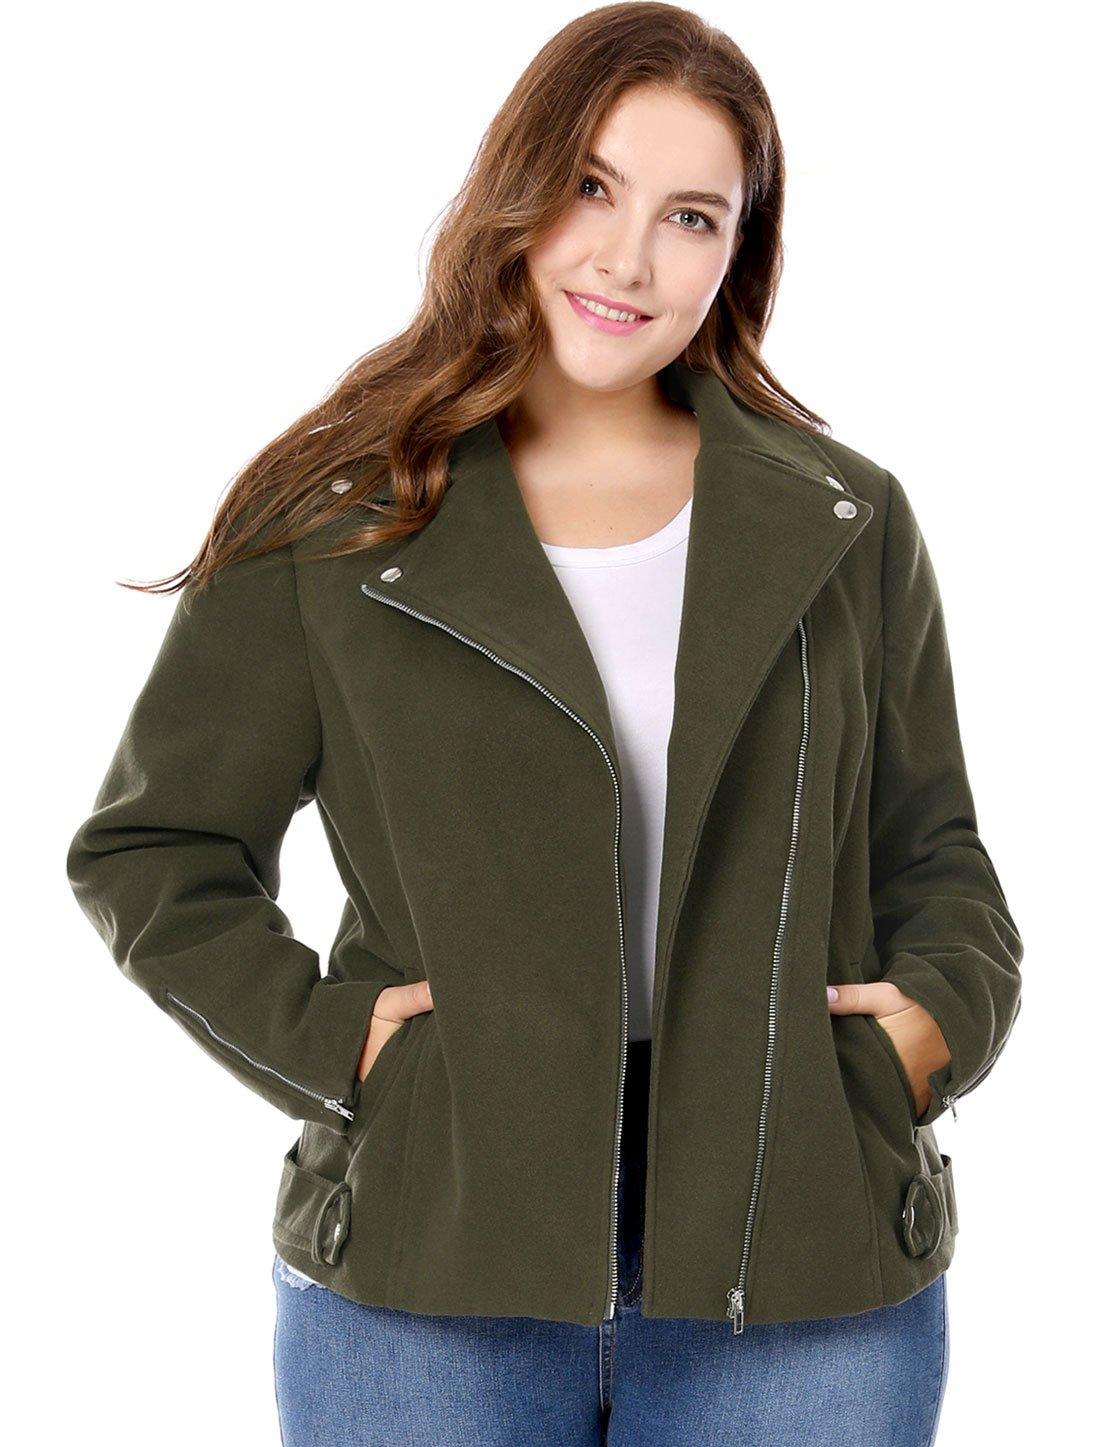 Agnes Orinda Women's Plus Size Convertible Collar Inclined Zip Closure Moto Jacket Green 1X